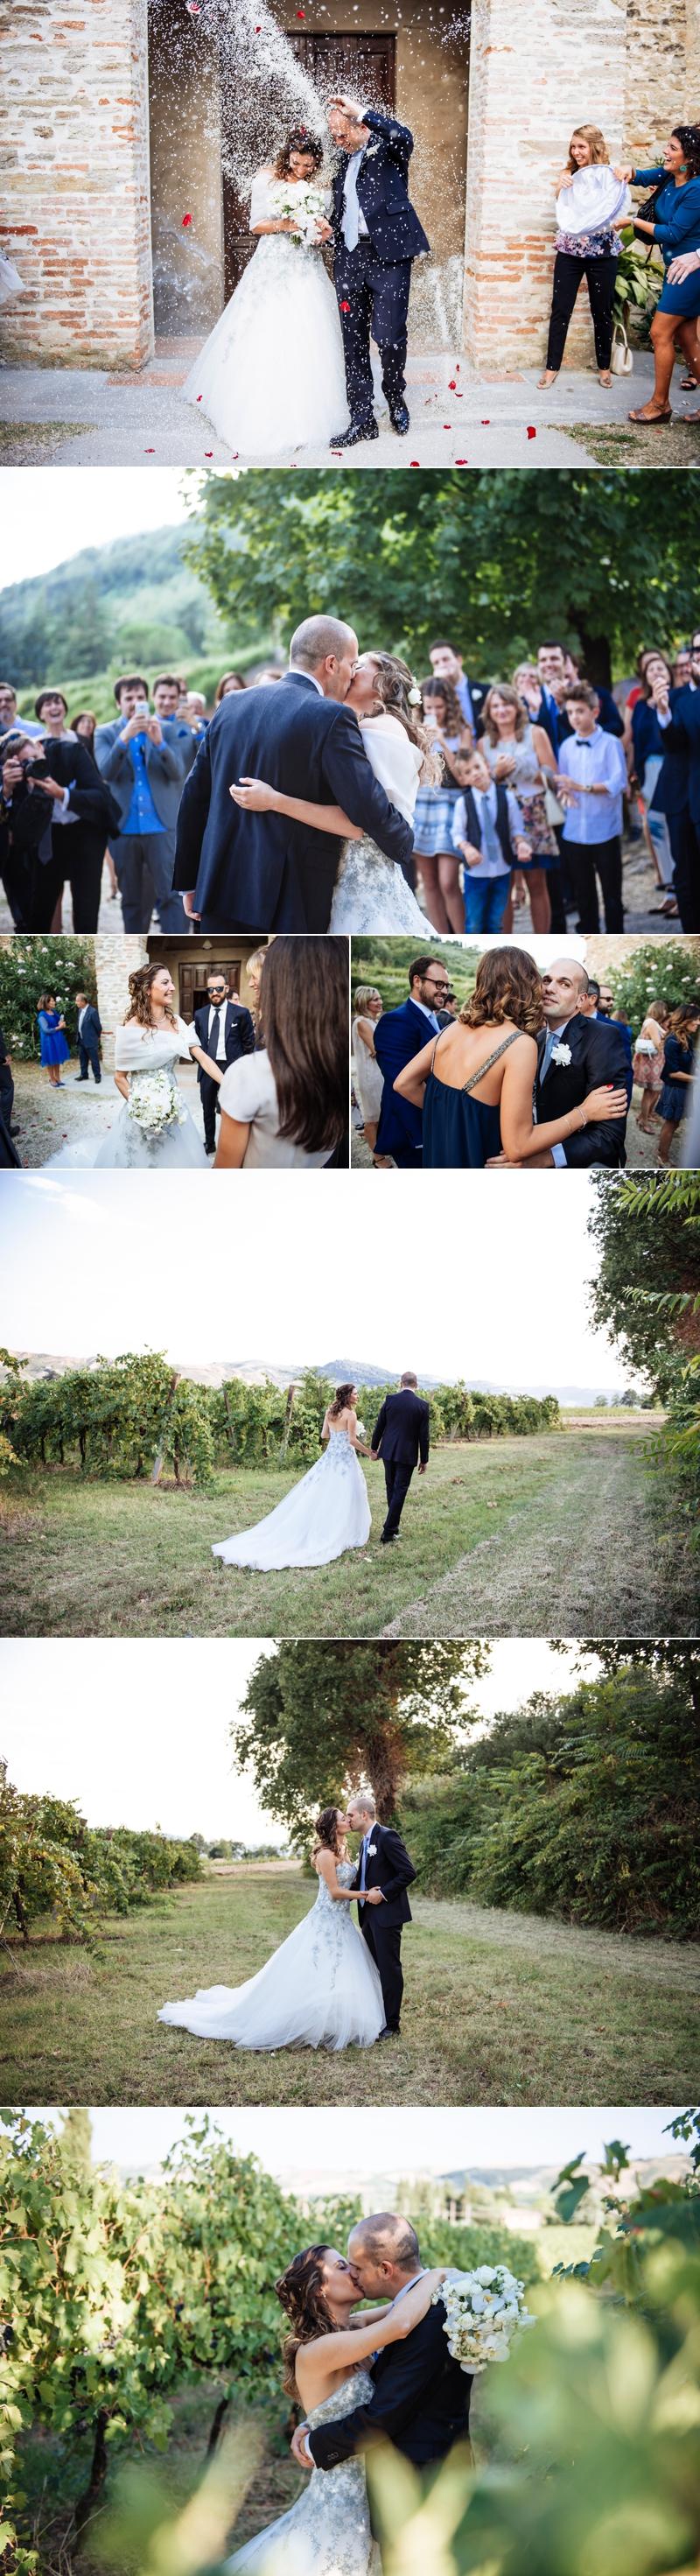 Fotografo Matrimonio Pieve del Tho Brisighella Monastero Scardavilla Meldola Valentina Cavallini 7